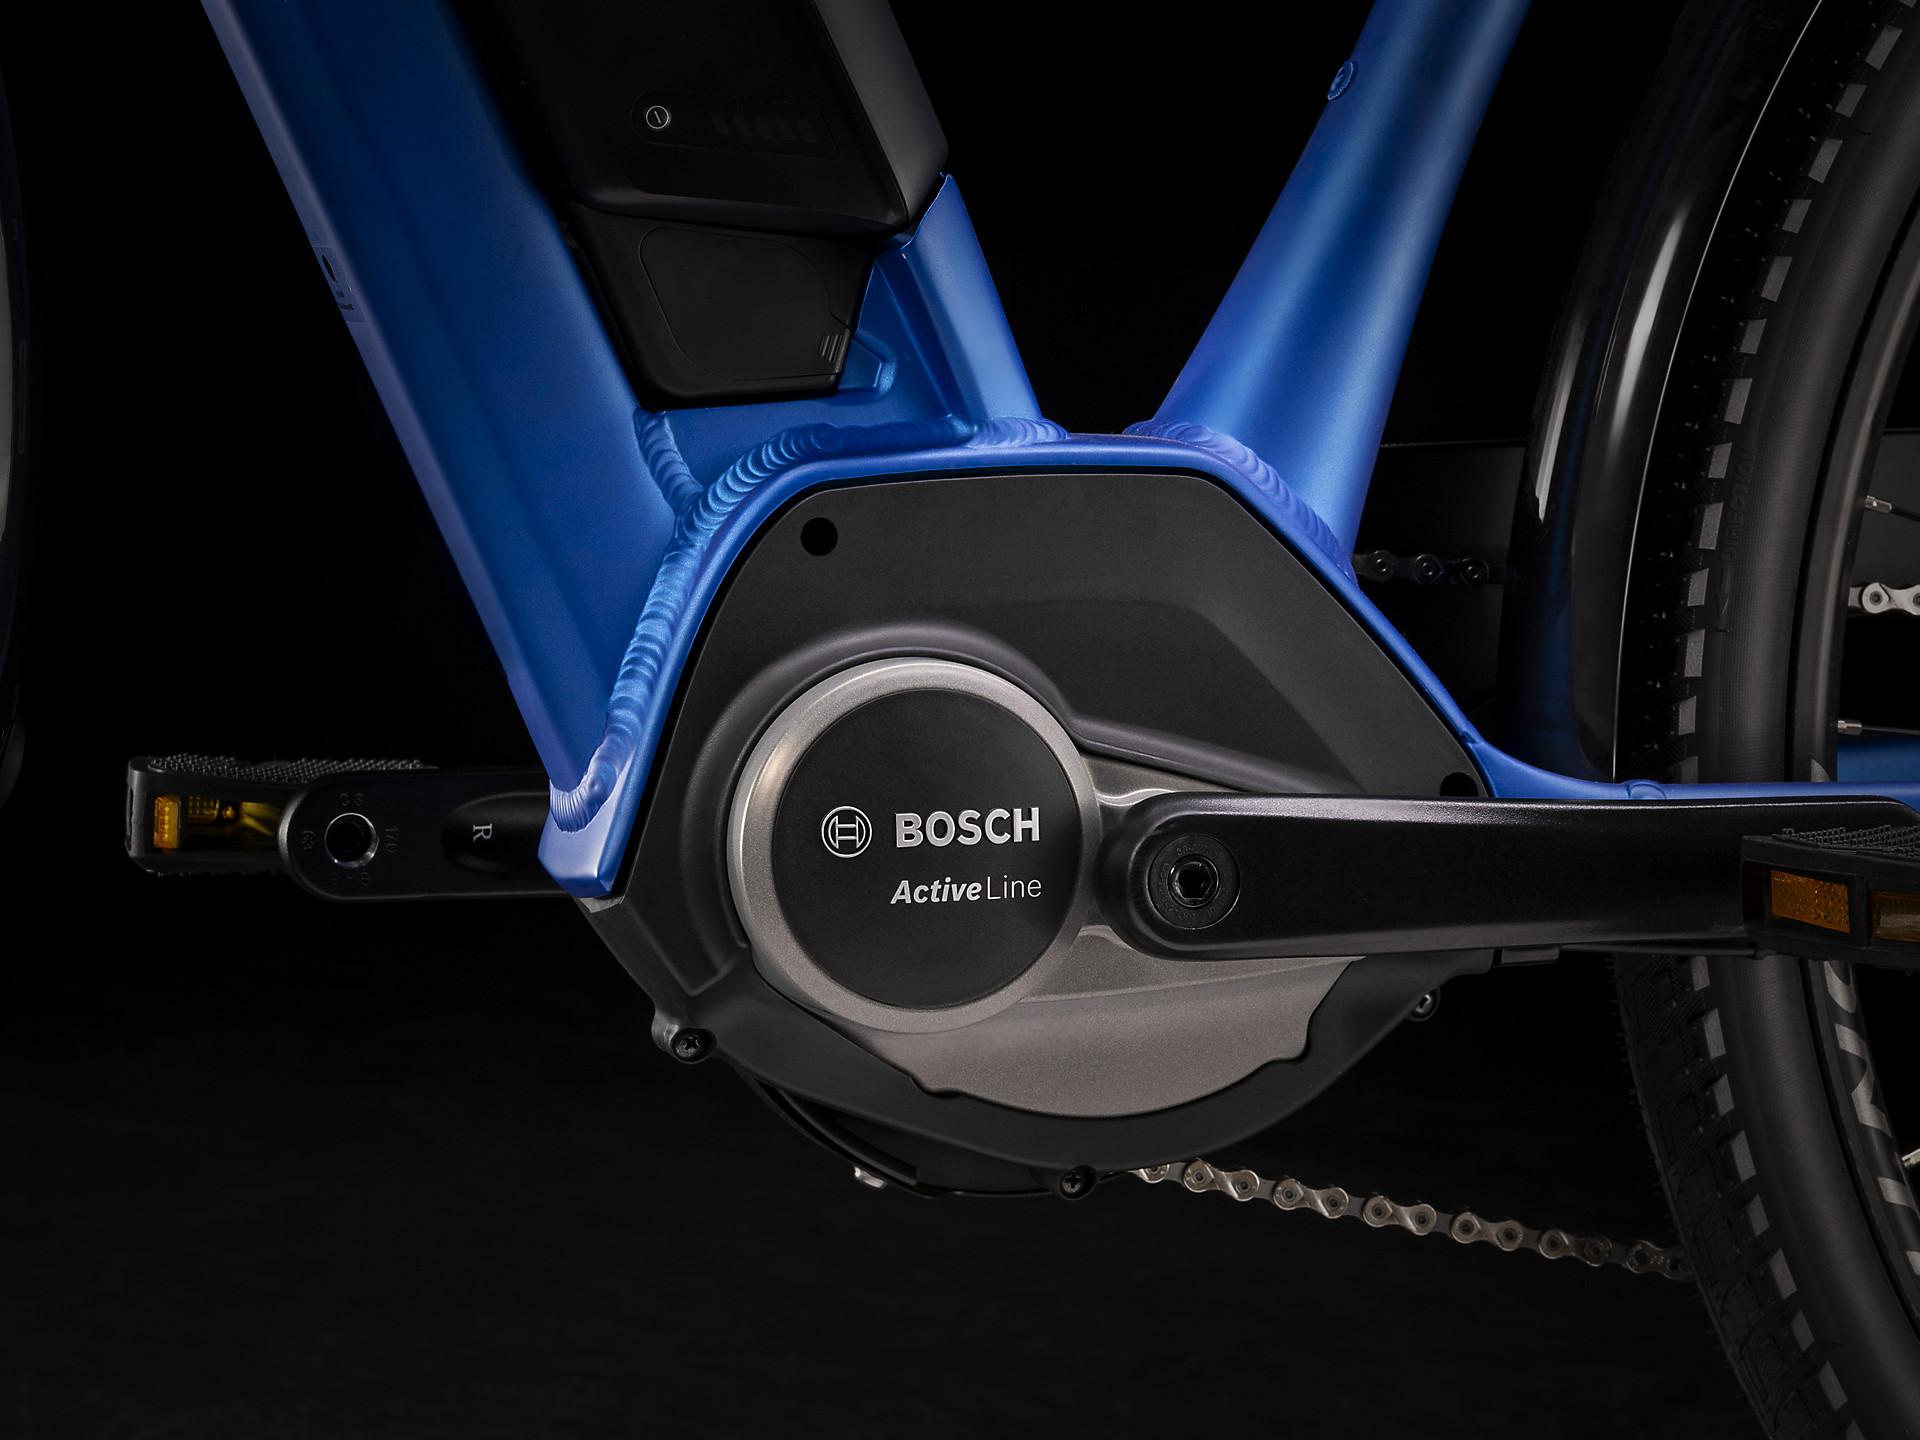 Bosch ActiveLine Mid-drive motor